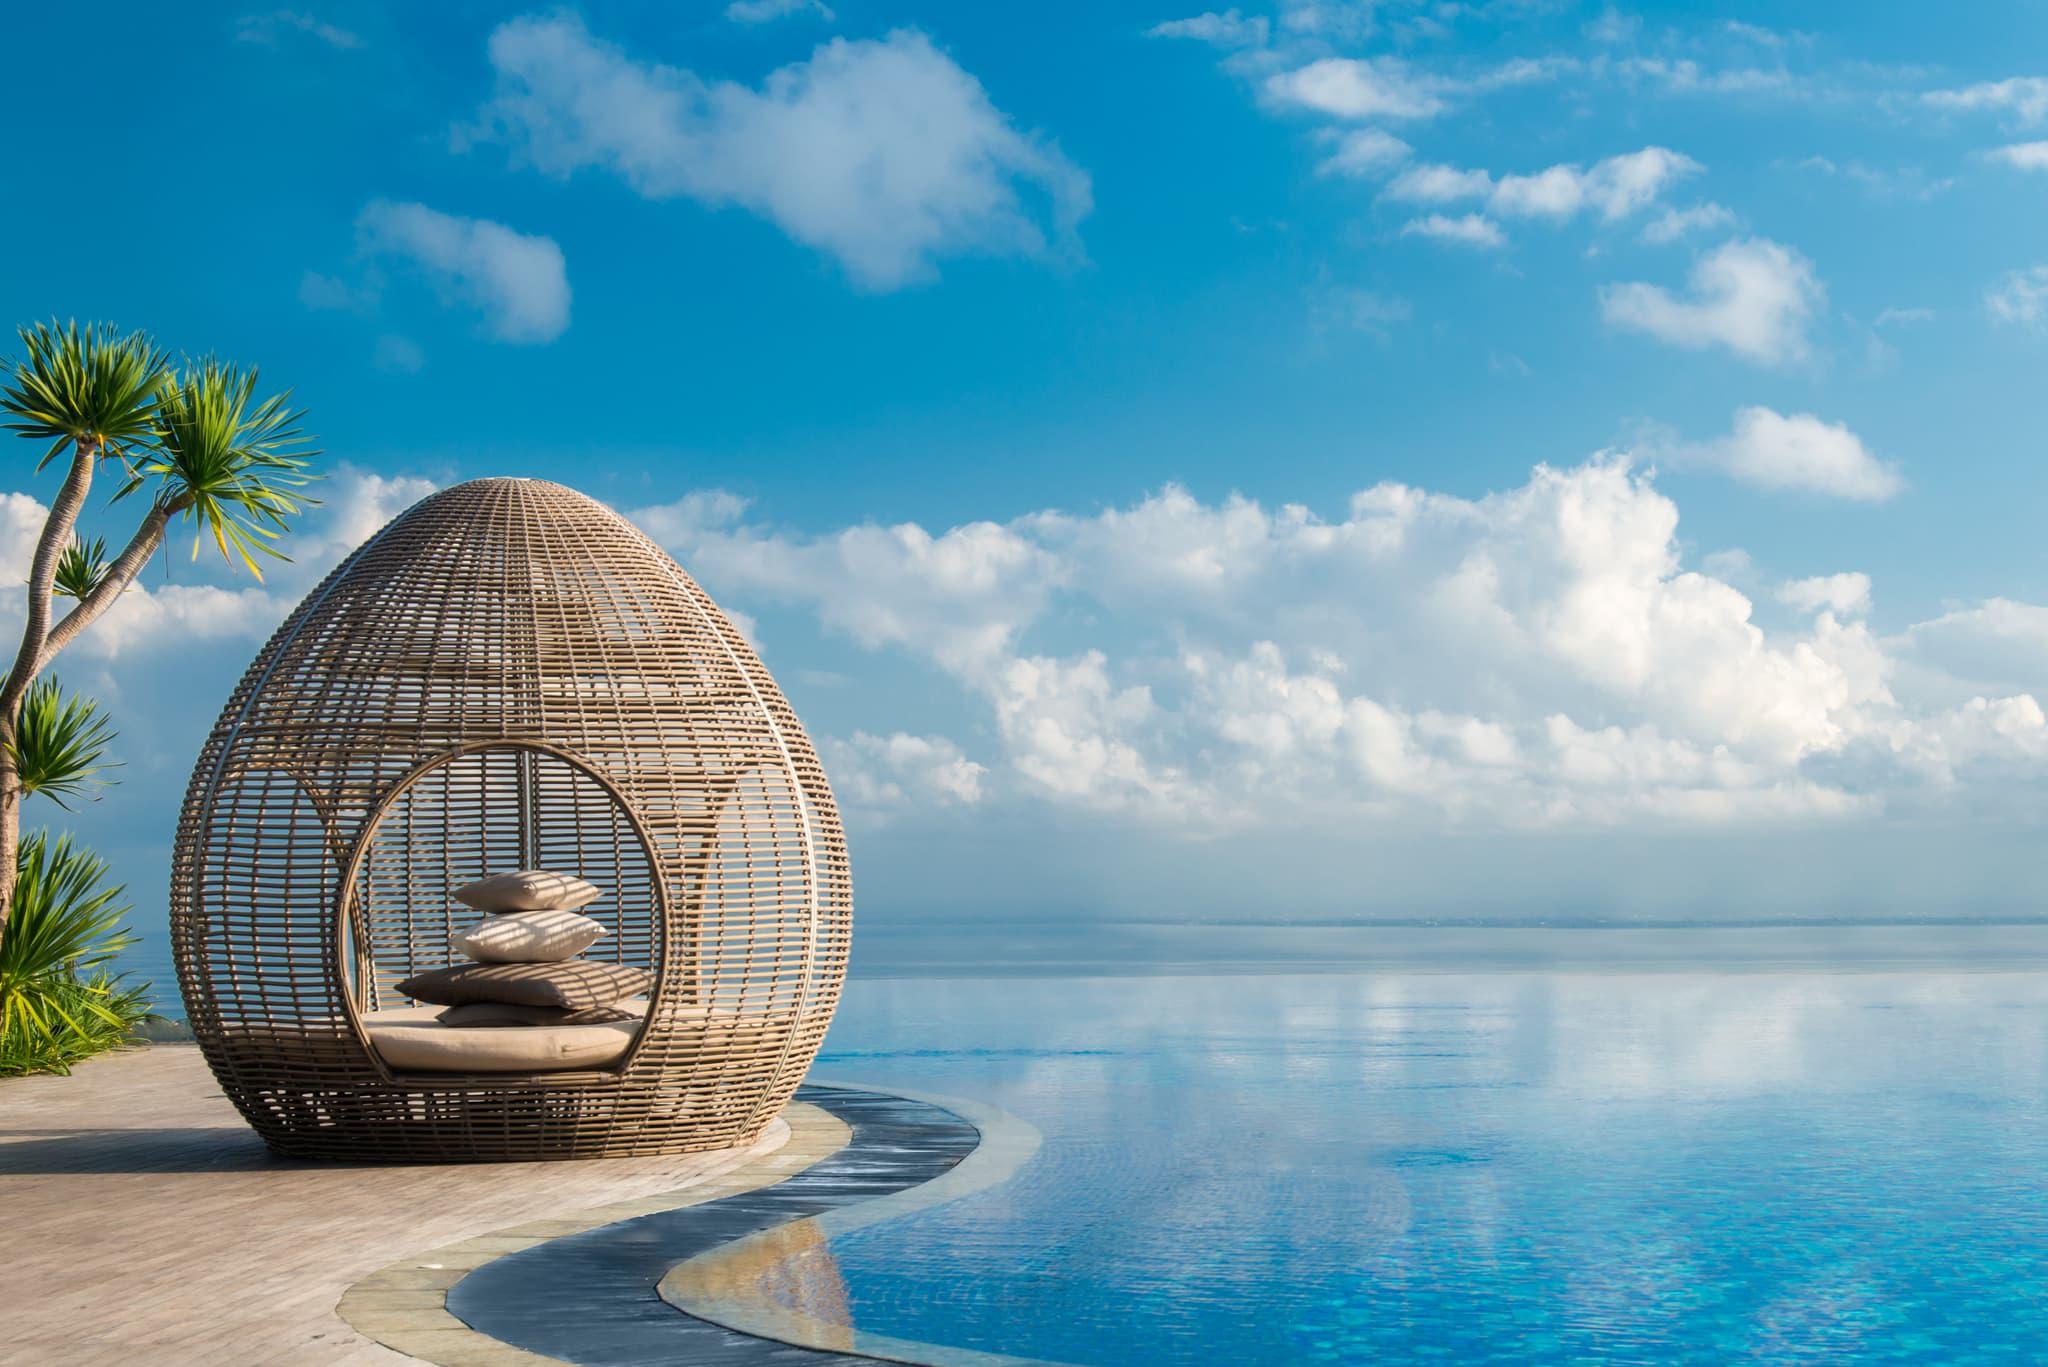 Renaissance Bali Uluwatu Resort & Spa Room Voucher - Di Indonesia Aja - 1 night voucher